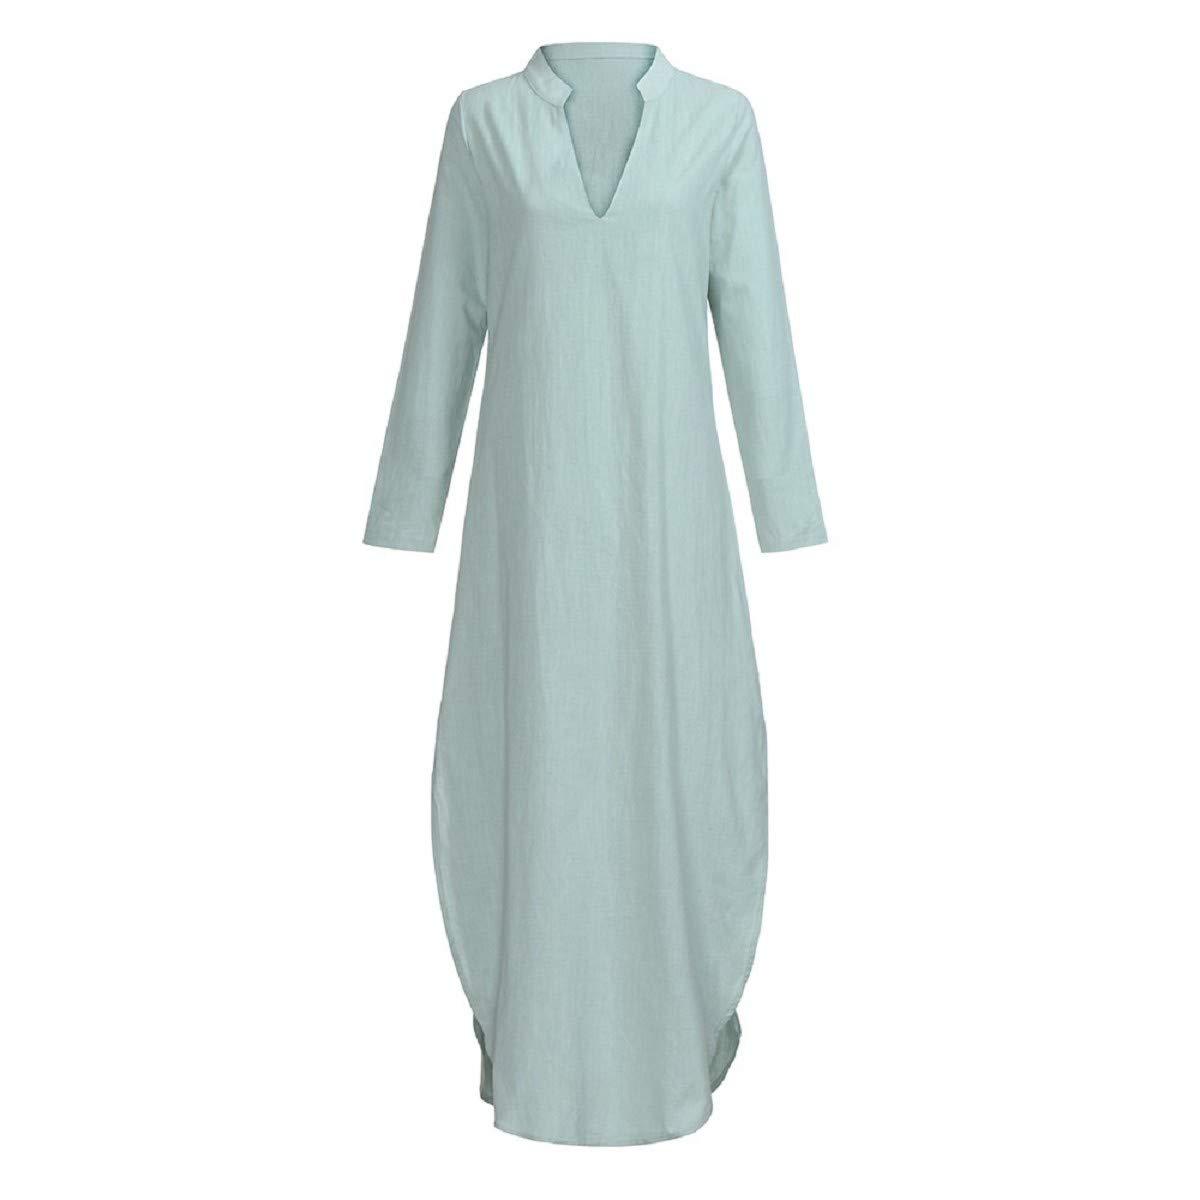 86210437f0d Amazon.com  OTINICE Women Long Sleeve Casual Loose Dresses V-Neck Linen Maxi  Beach Long Dresses  Clothing